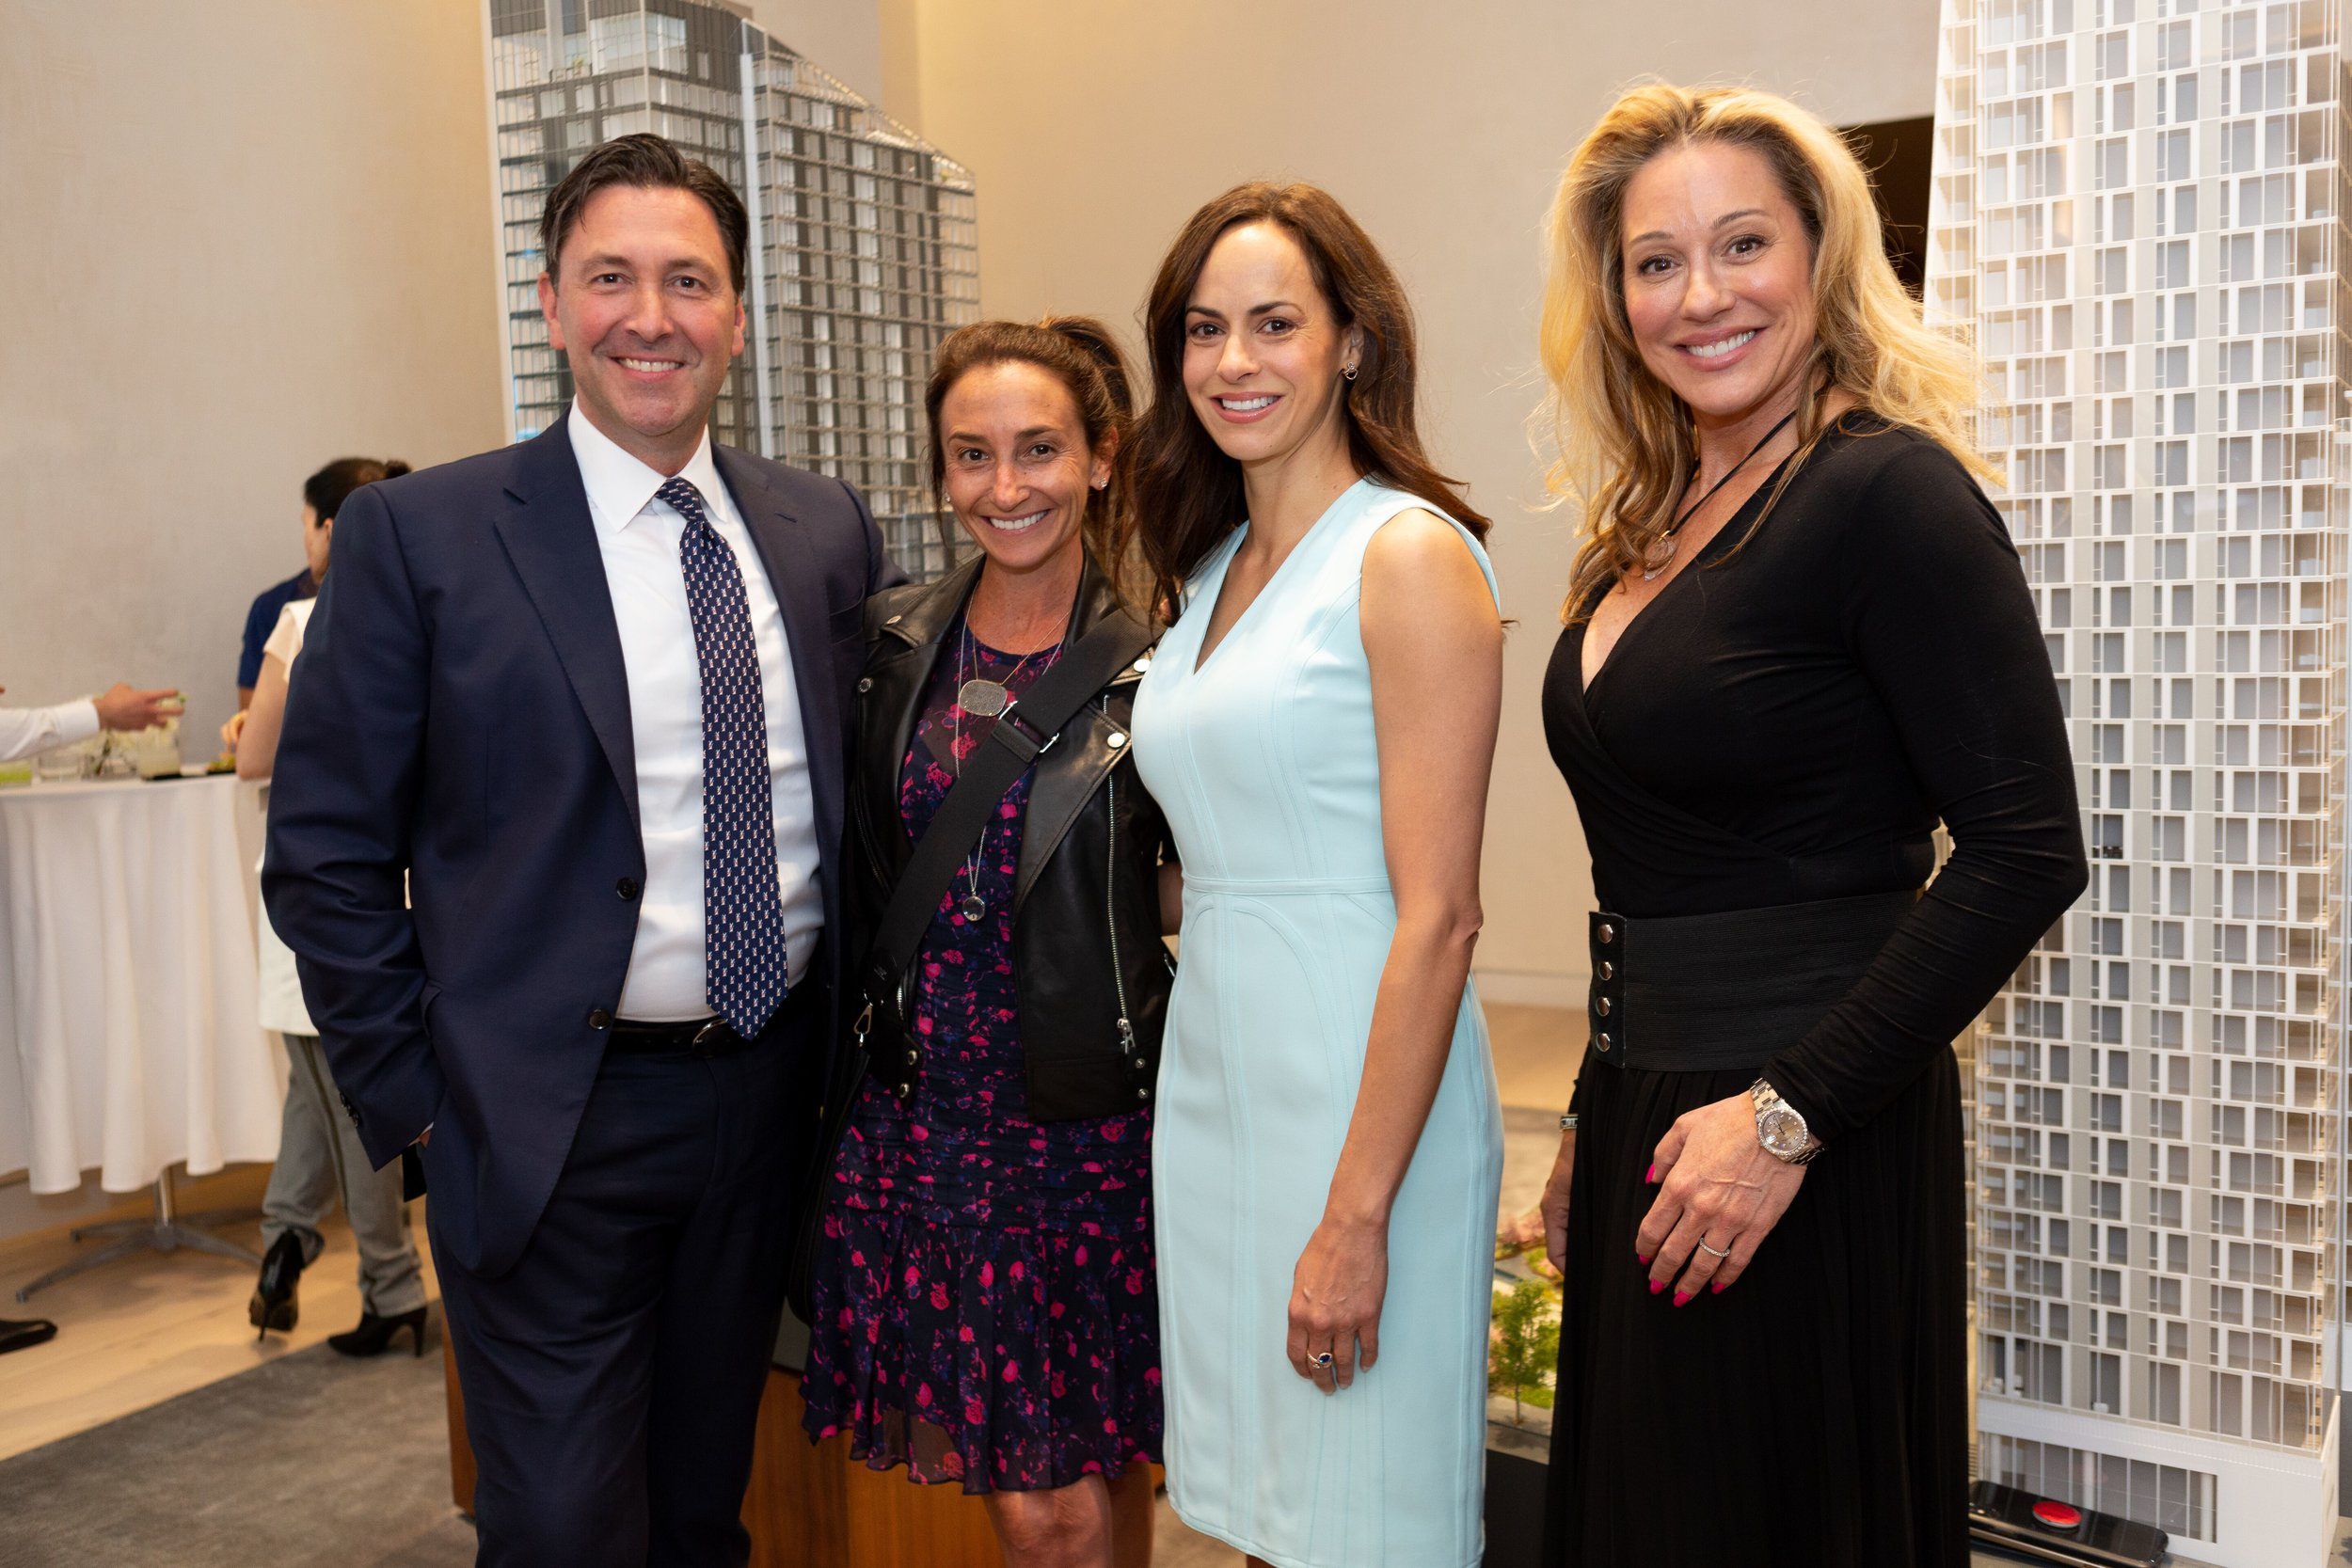 Gordon Hoppe,Kelly Kennedy Mack, Melissa Ziweslin, Norma-Jean Callahan. Photo credit : Jill Lotenberg